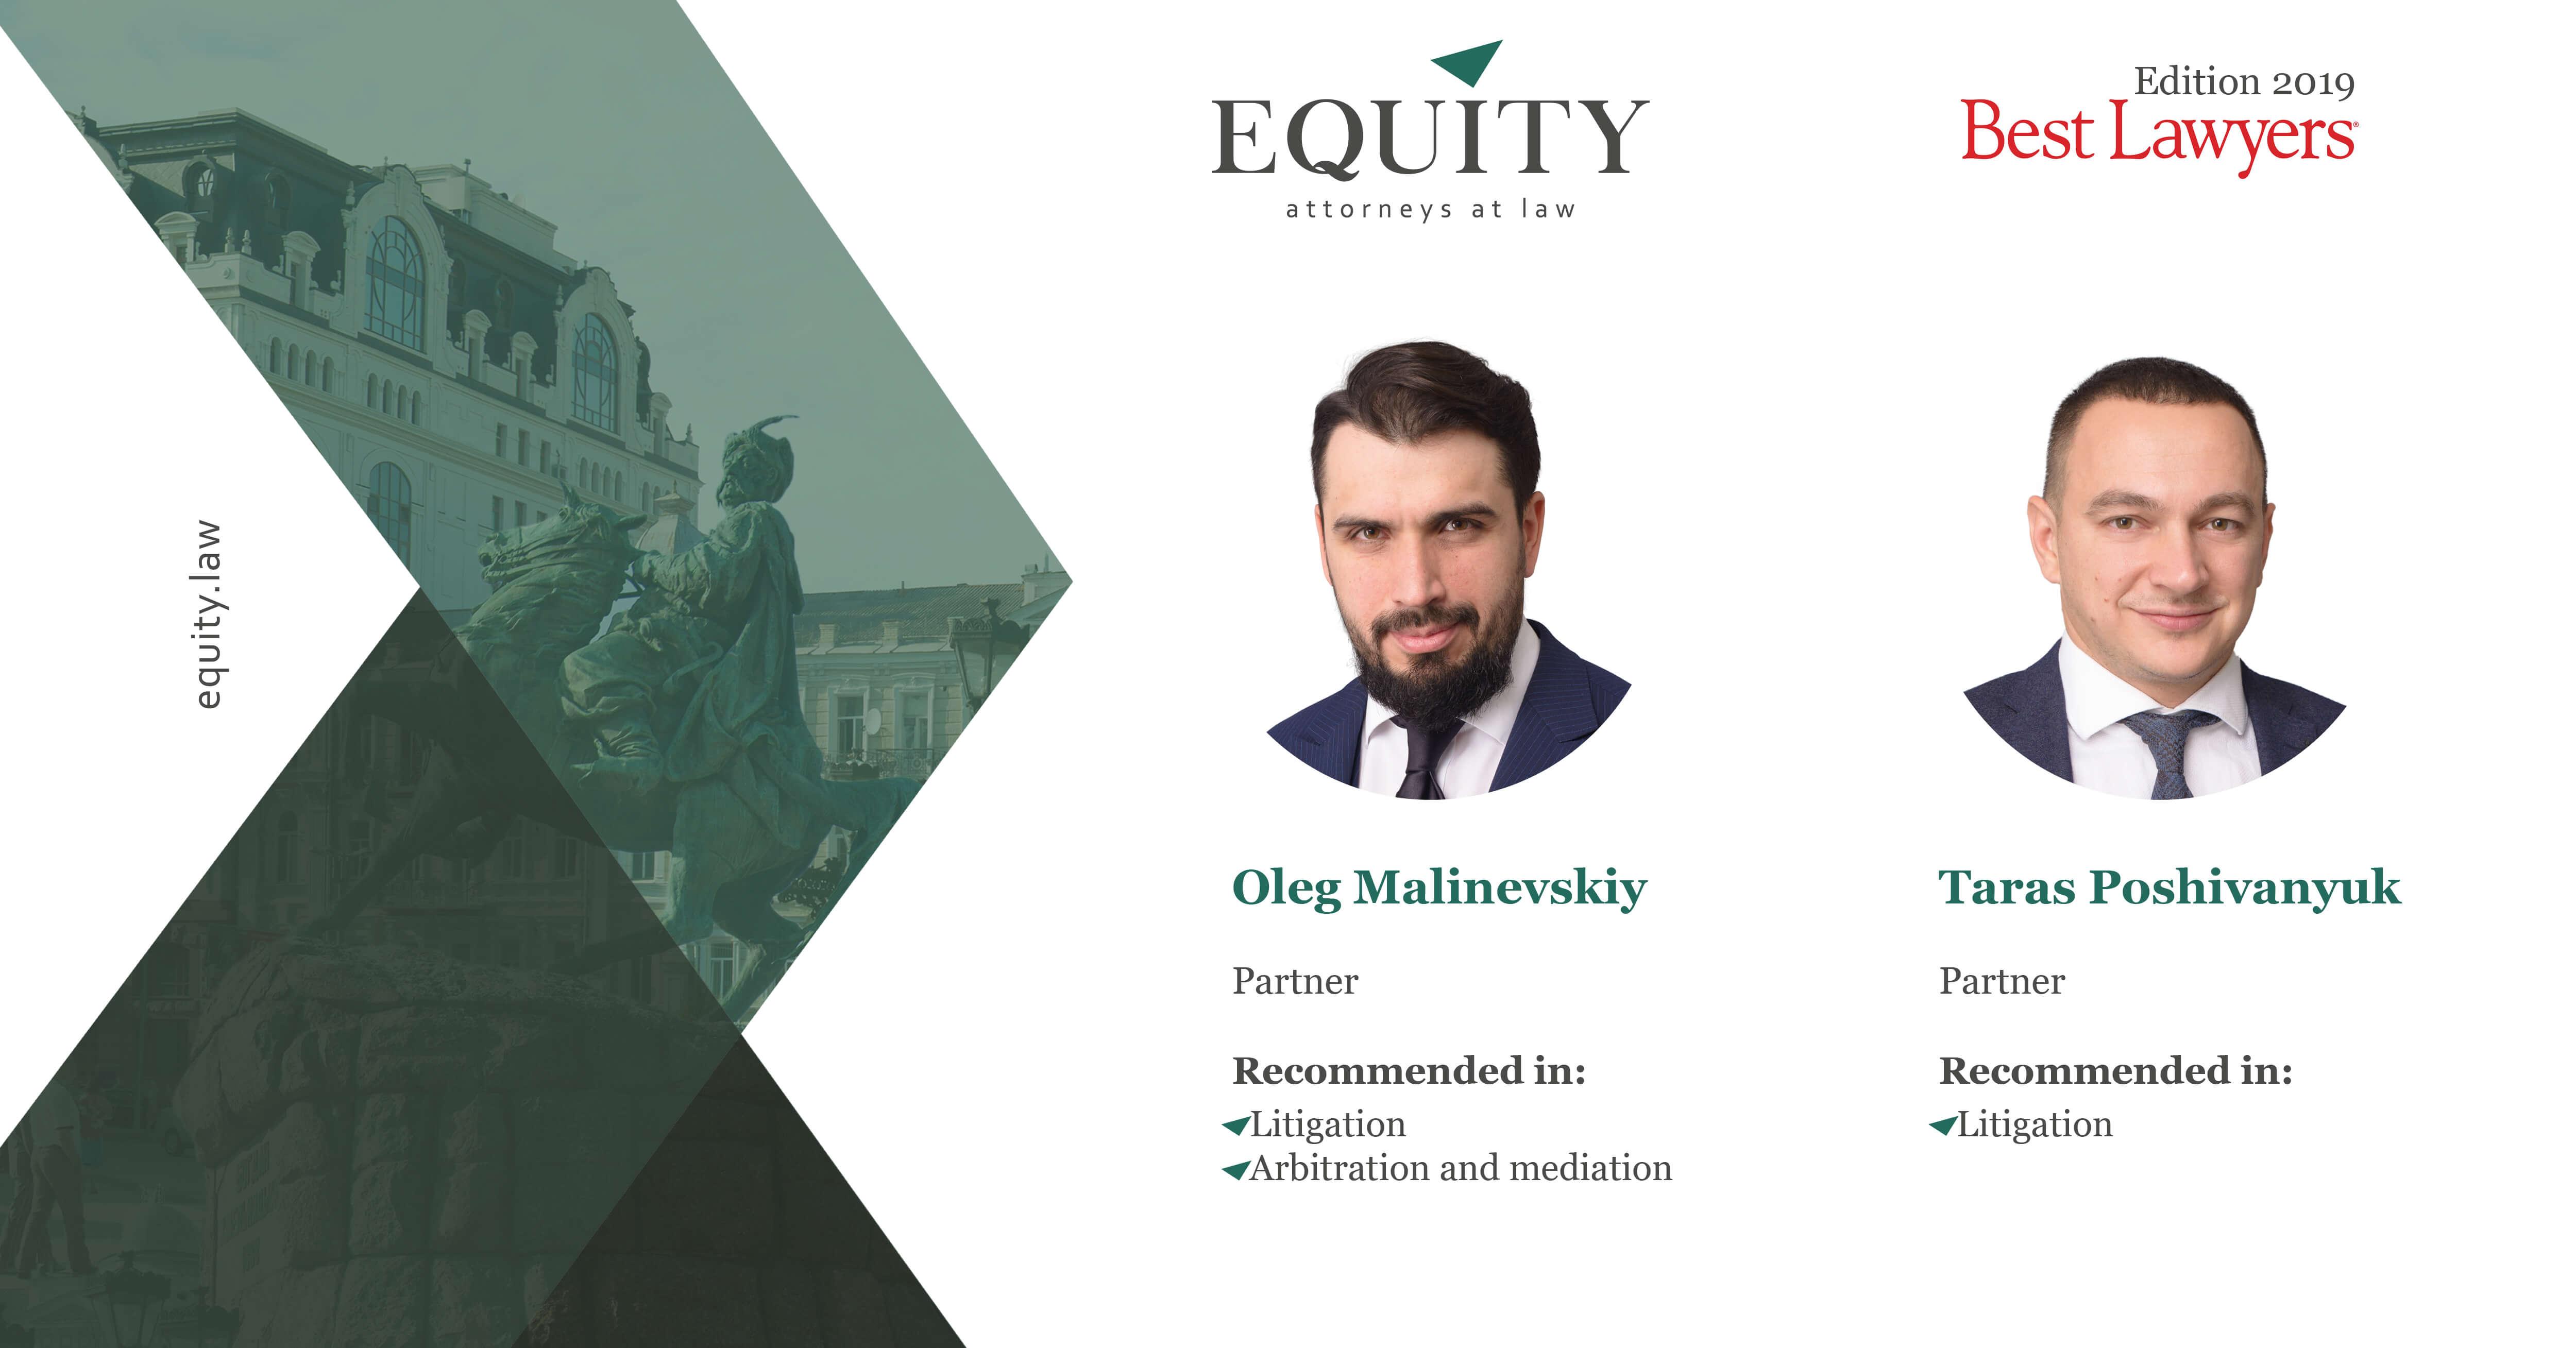 "Партнери <span class=""equity"">EQUITY</span> отримали визнання рейтингового агентства The Best Lawyers!"